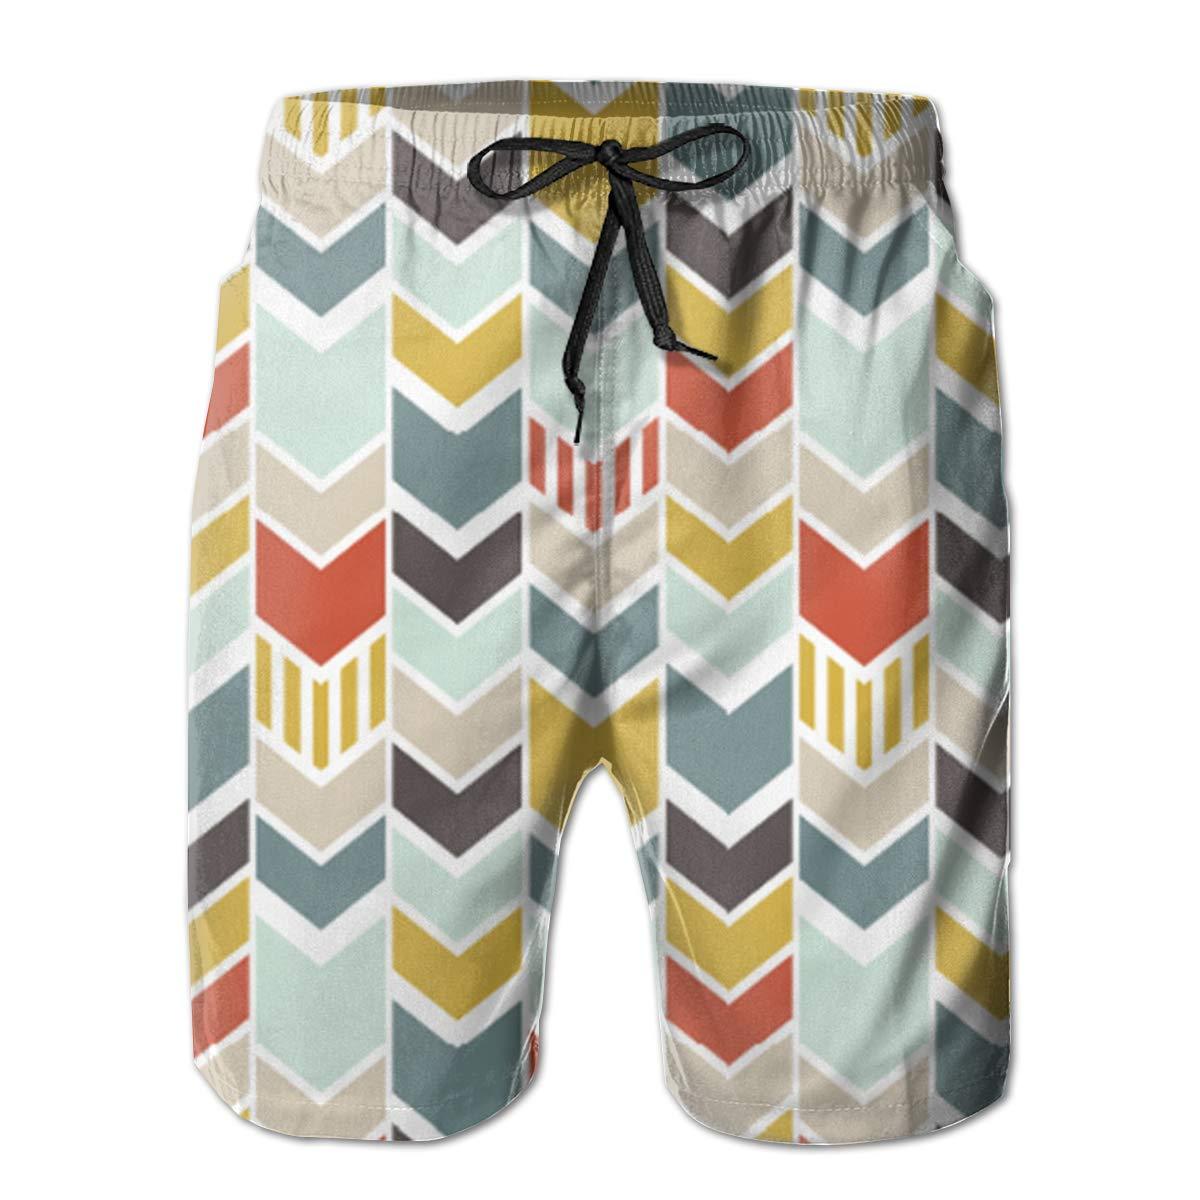 Colorful Chevron Mens Board Shorts Swim Mesh Lining and Side Pocket White